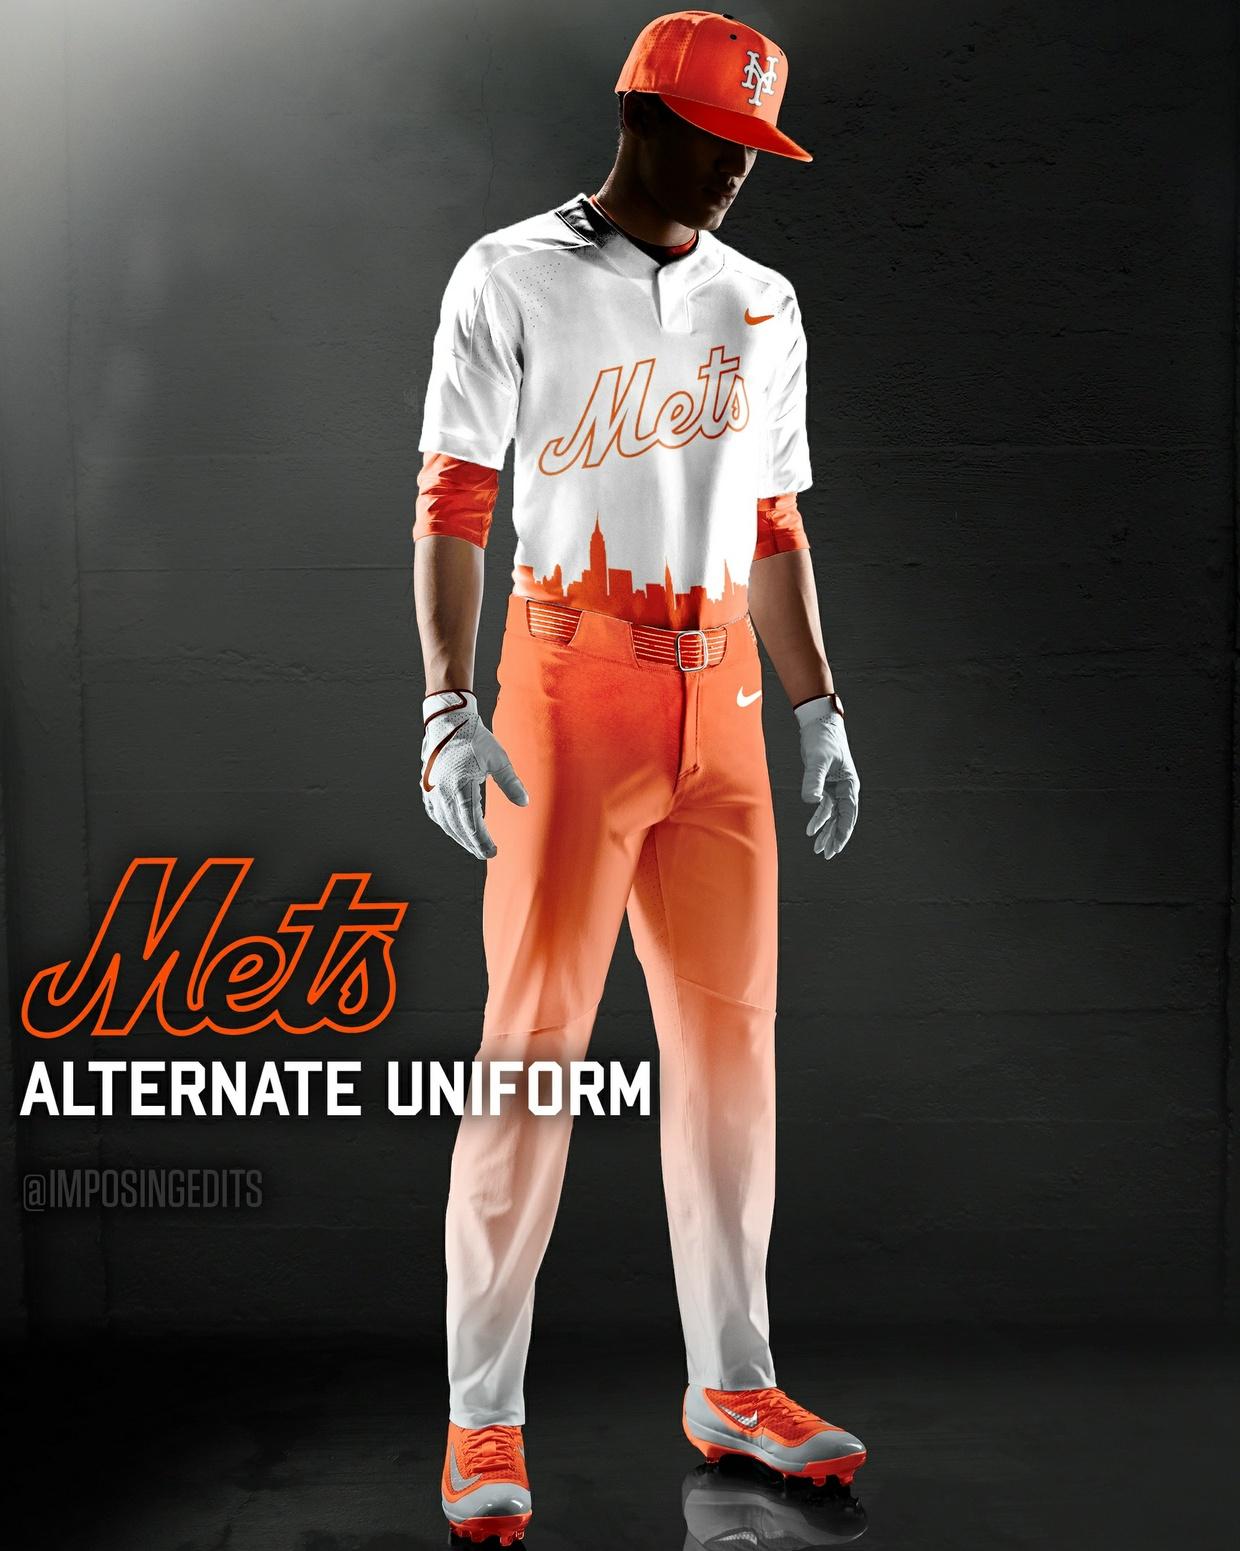 Baseball Alternate Uniform Template (PSD)